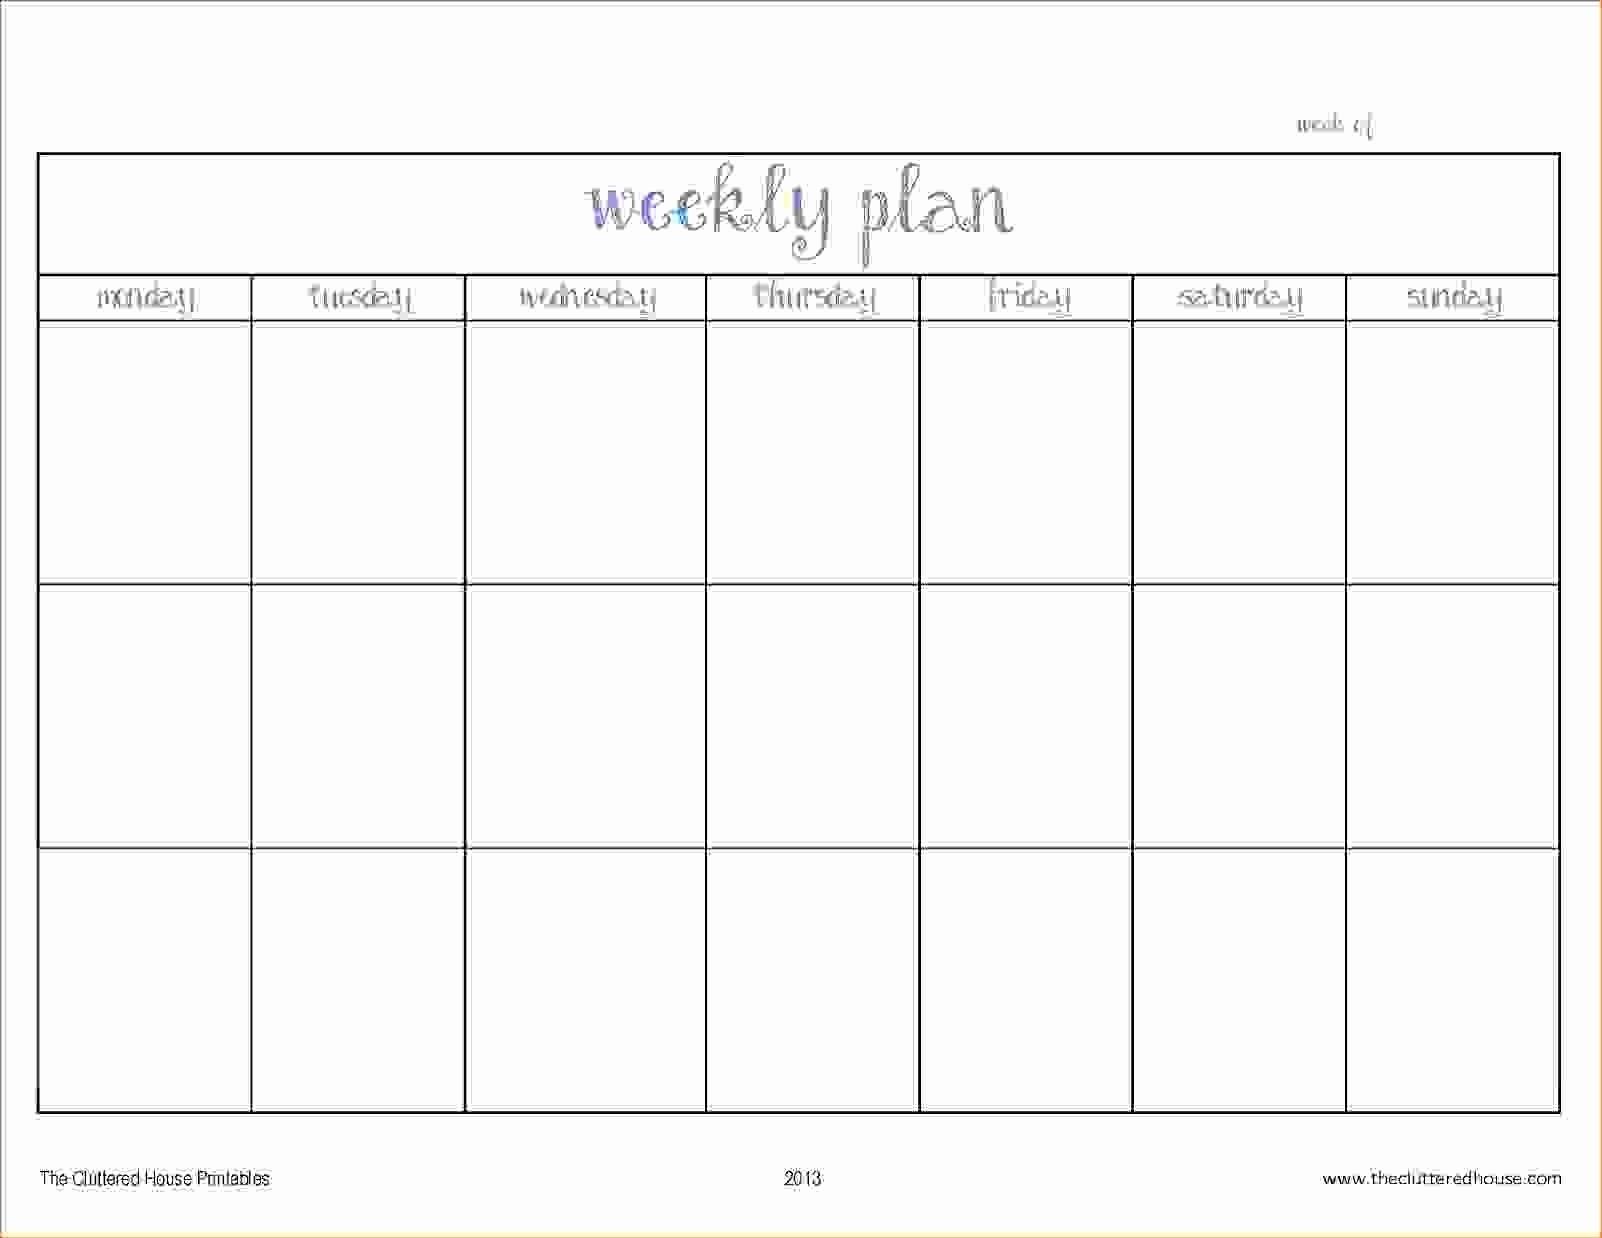 9 Week Calendar Template | Igotlockedout